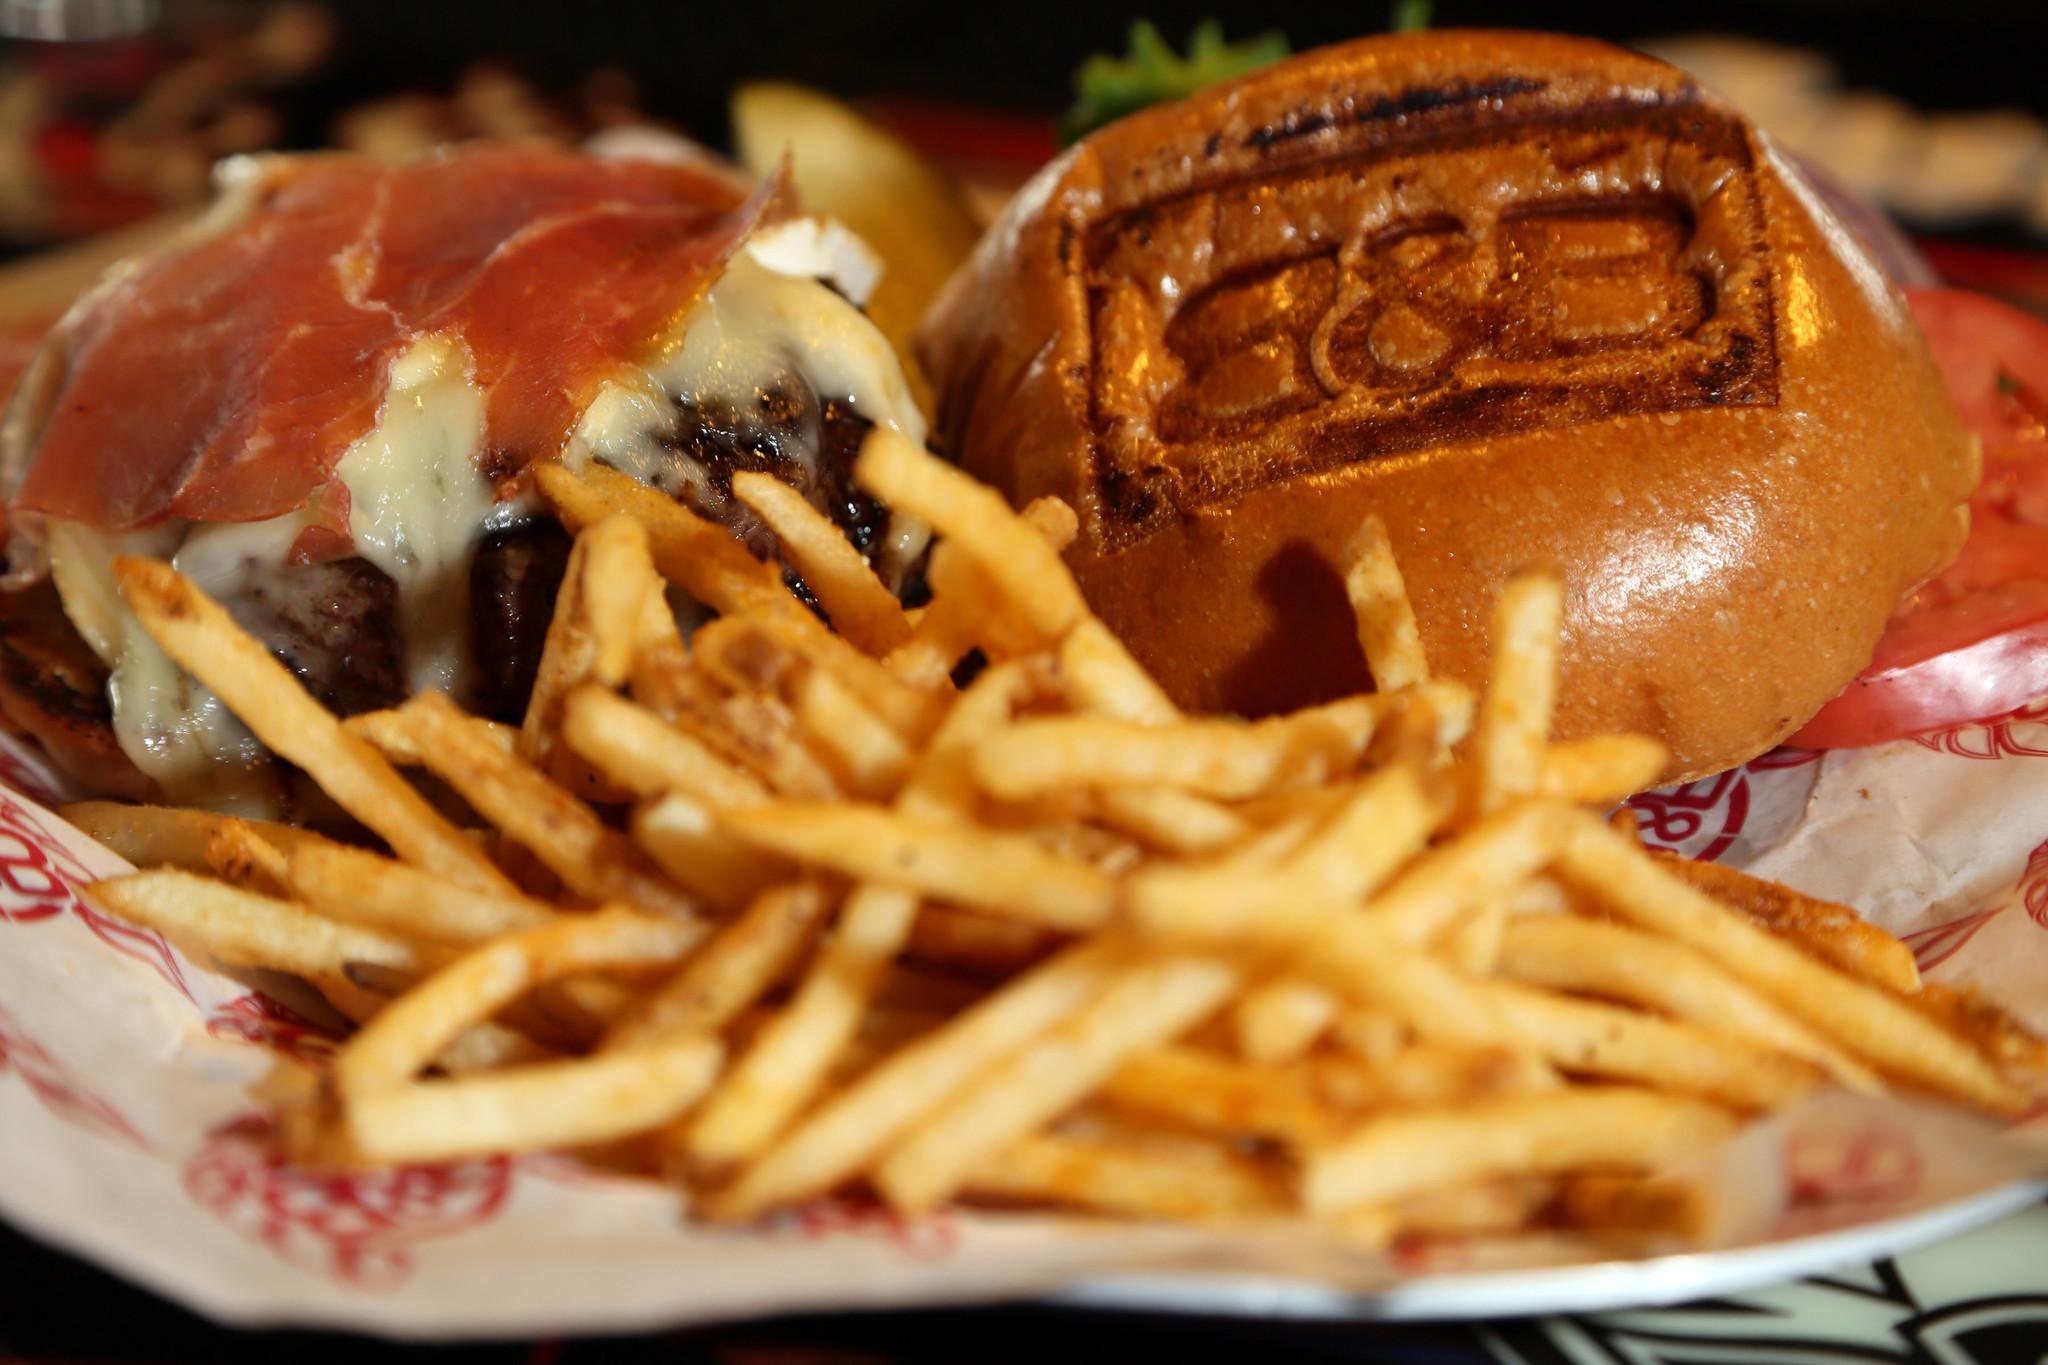 Top Broward restaurants - Burger and Beer Joint in Pembroke Pines